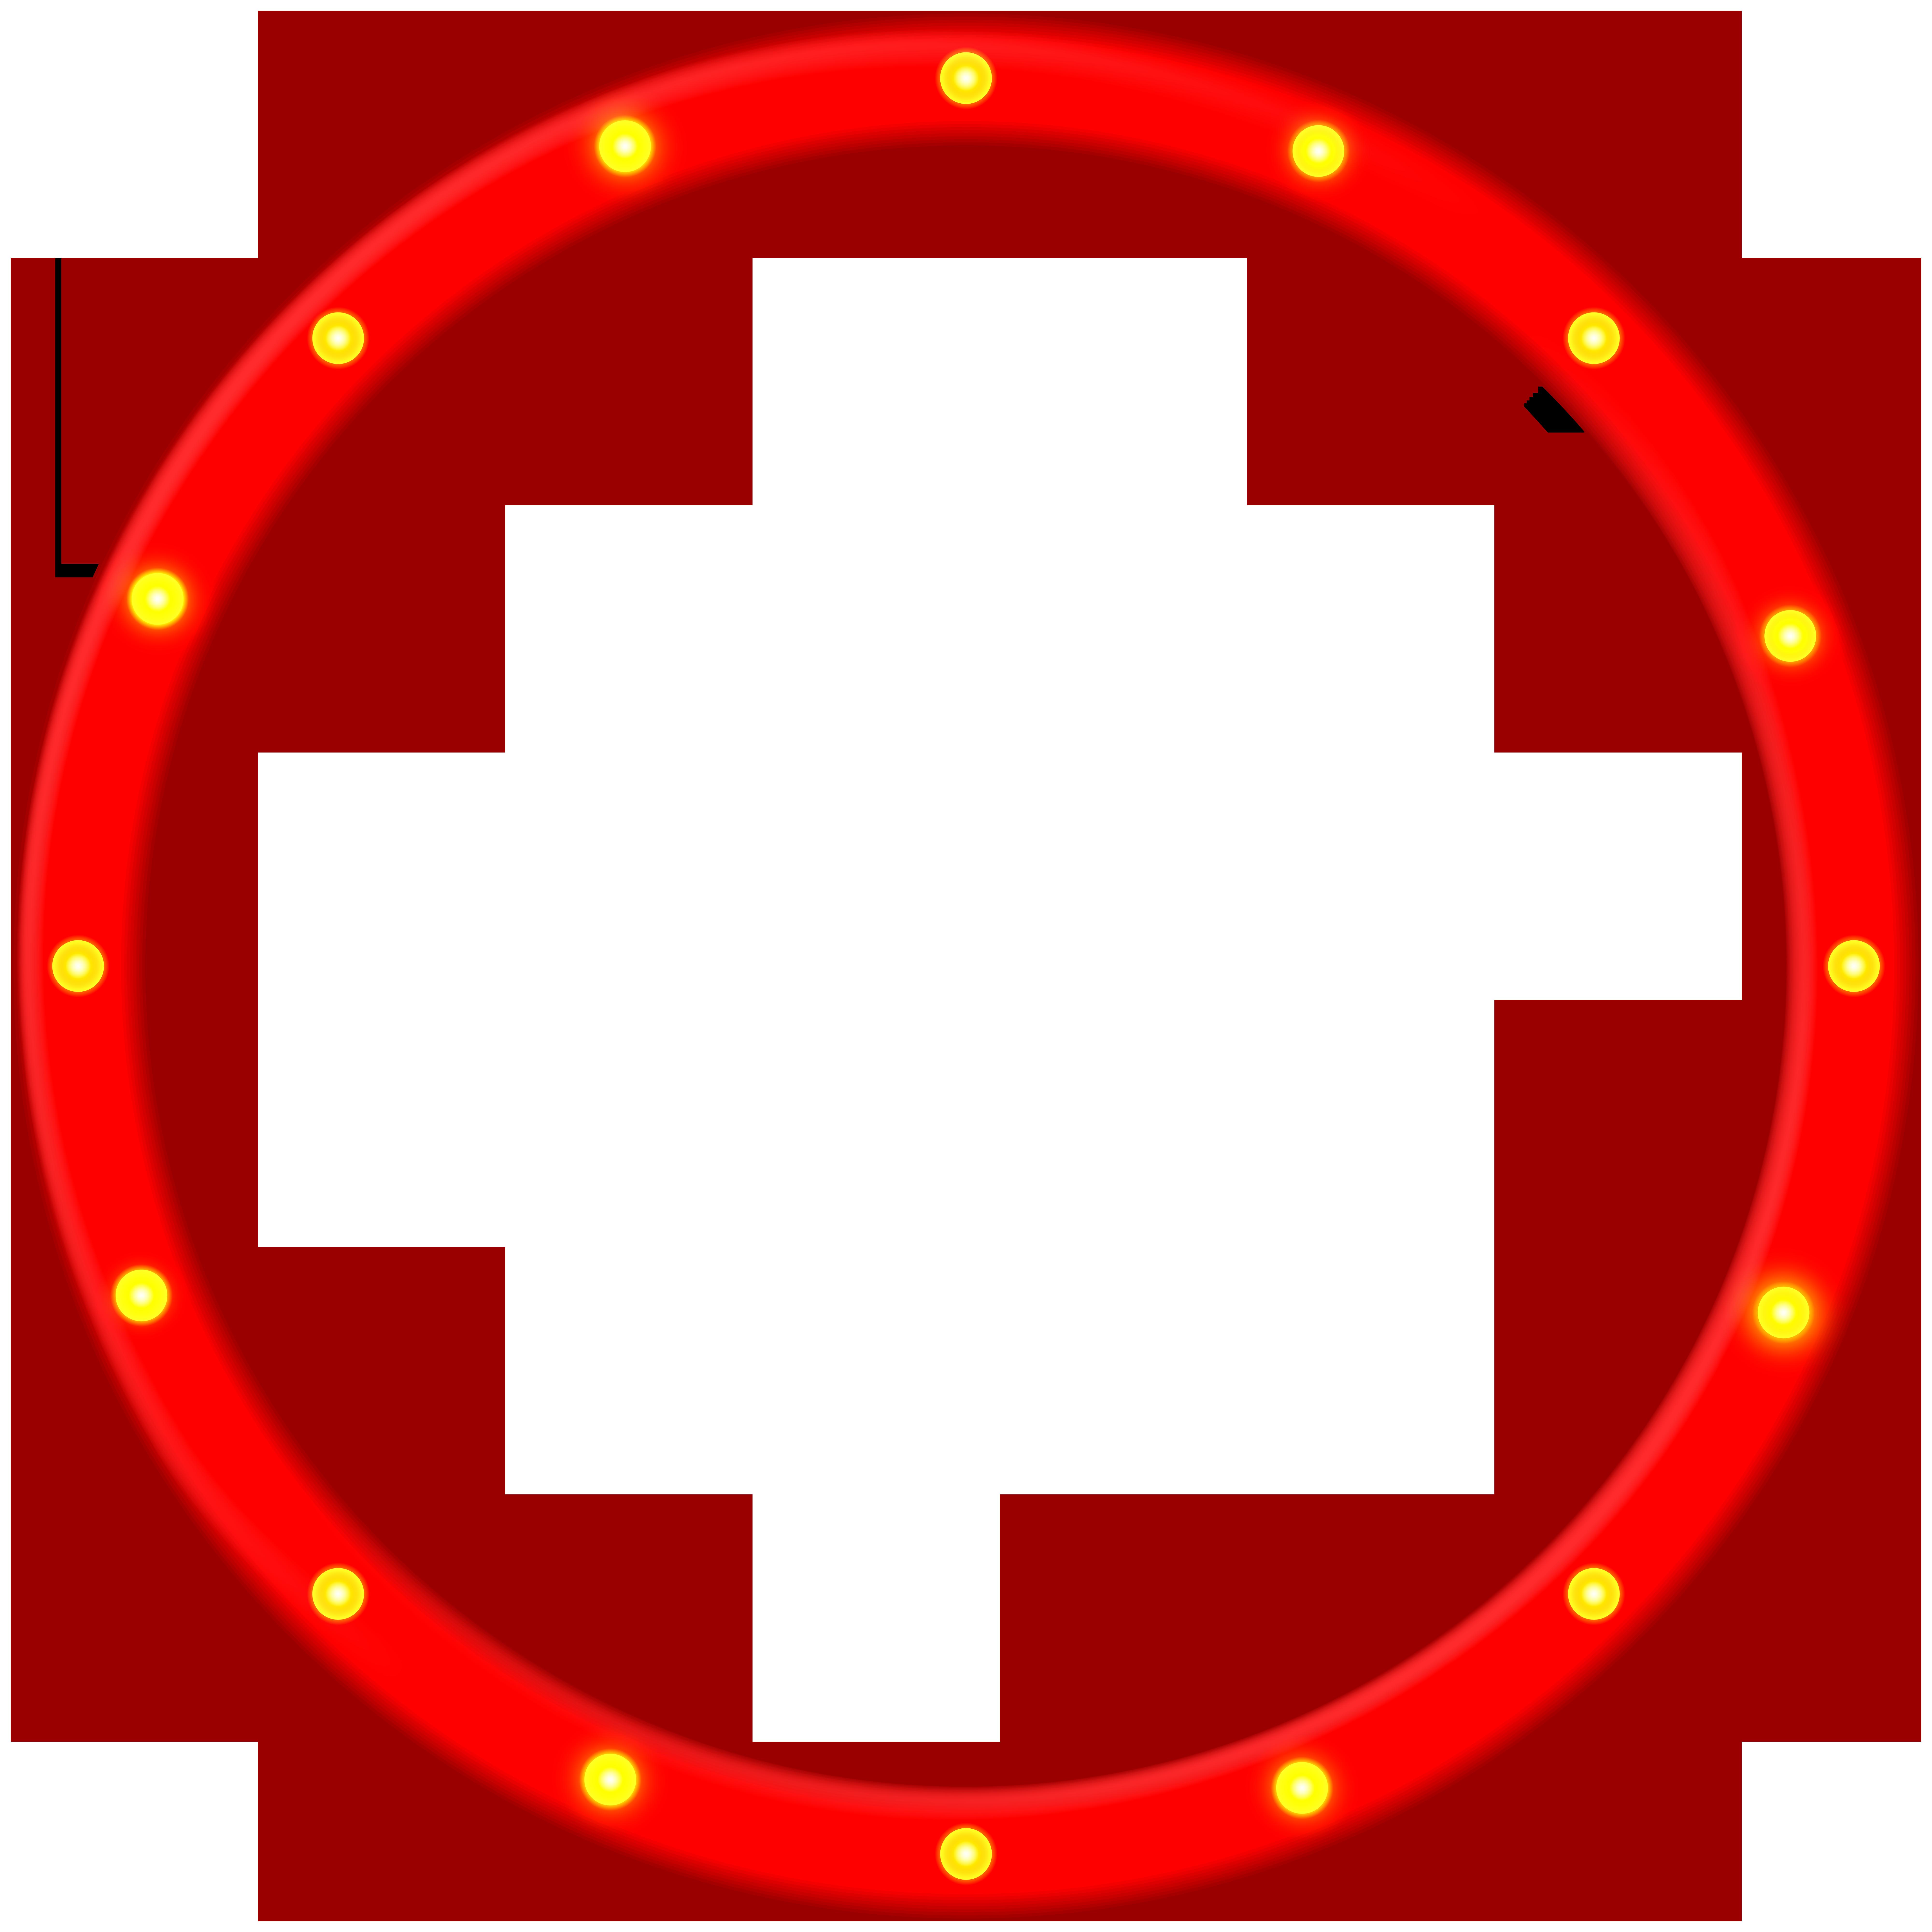 Red Round Border Frame PNG Clip Art Image.